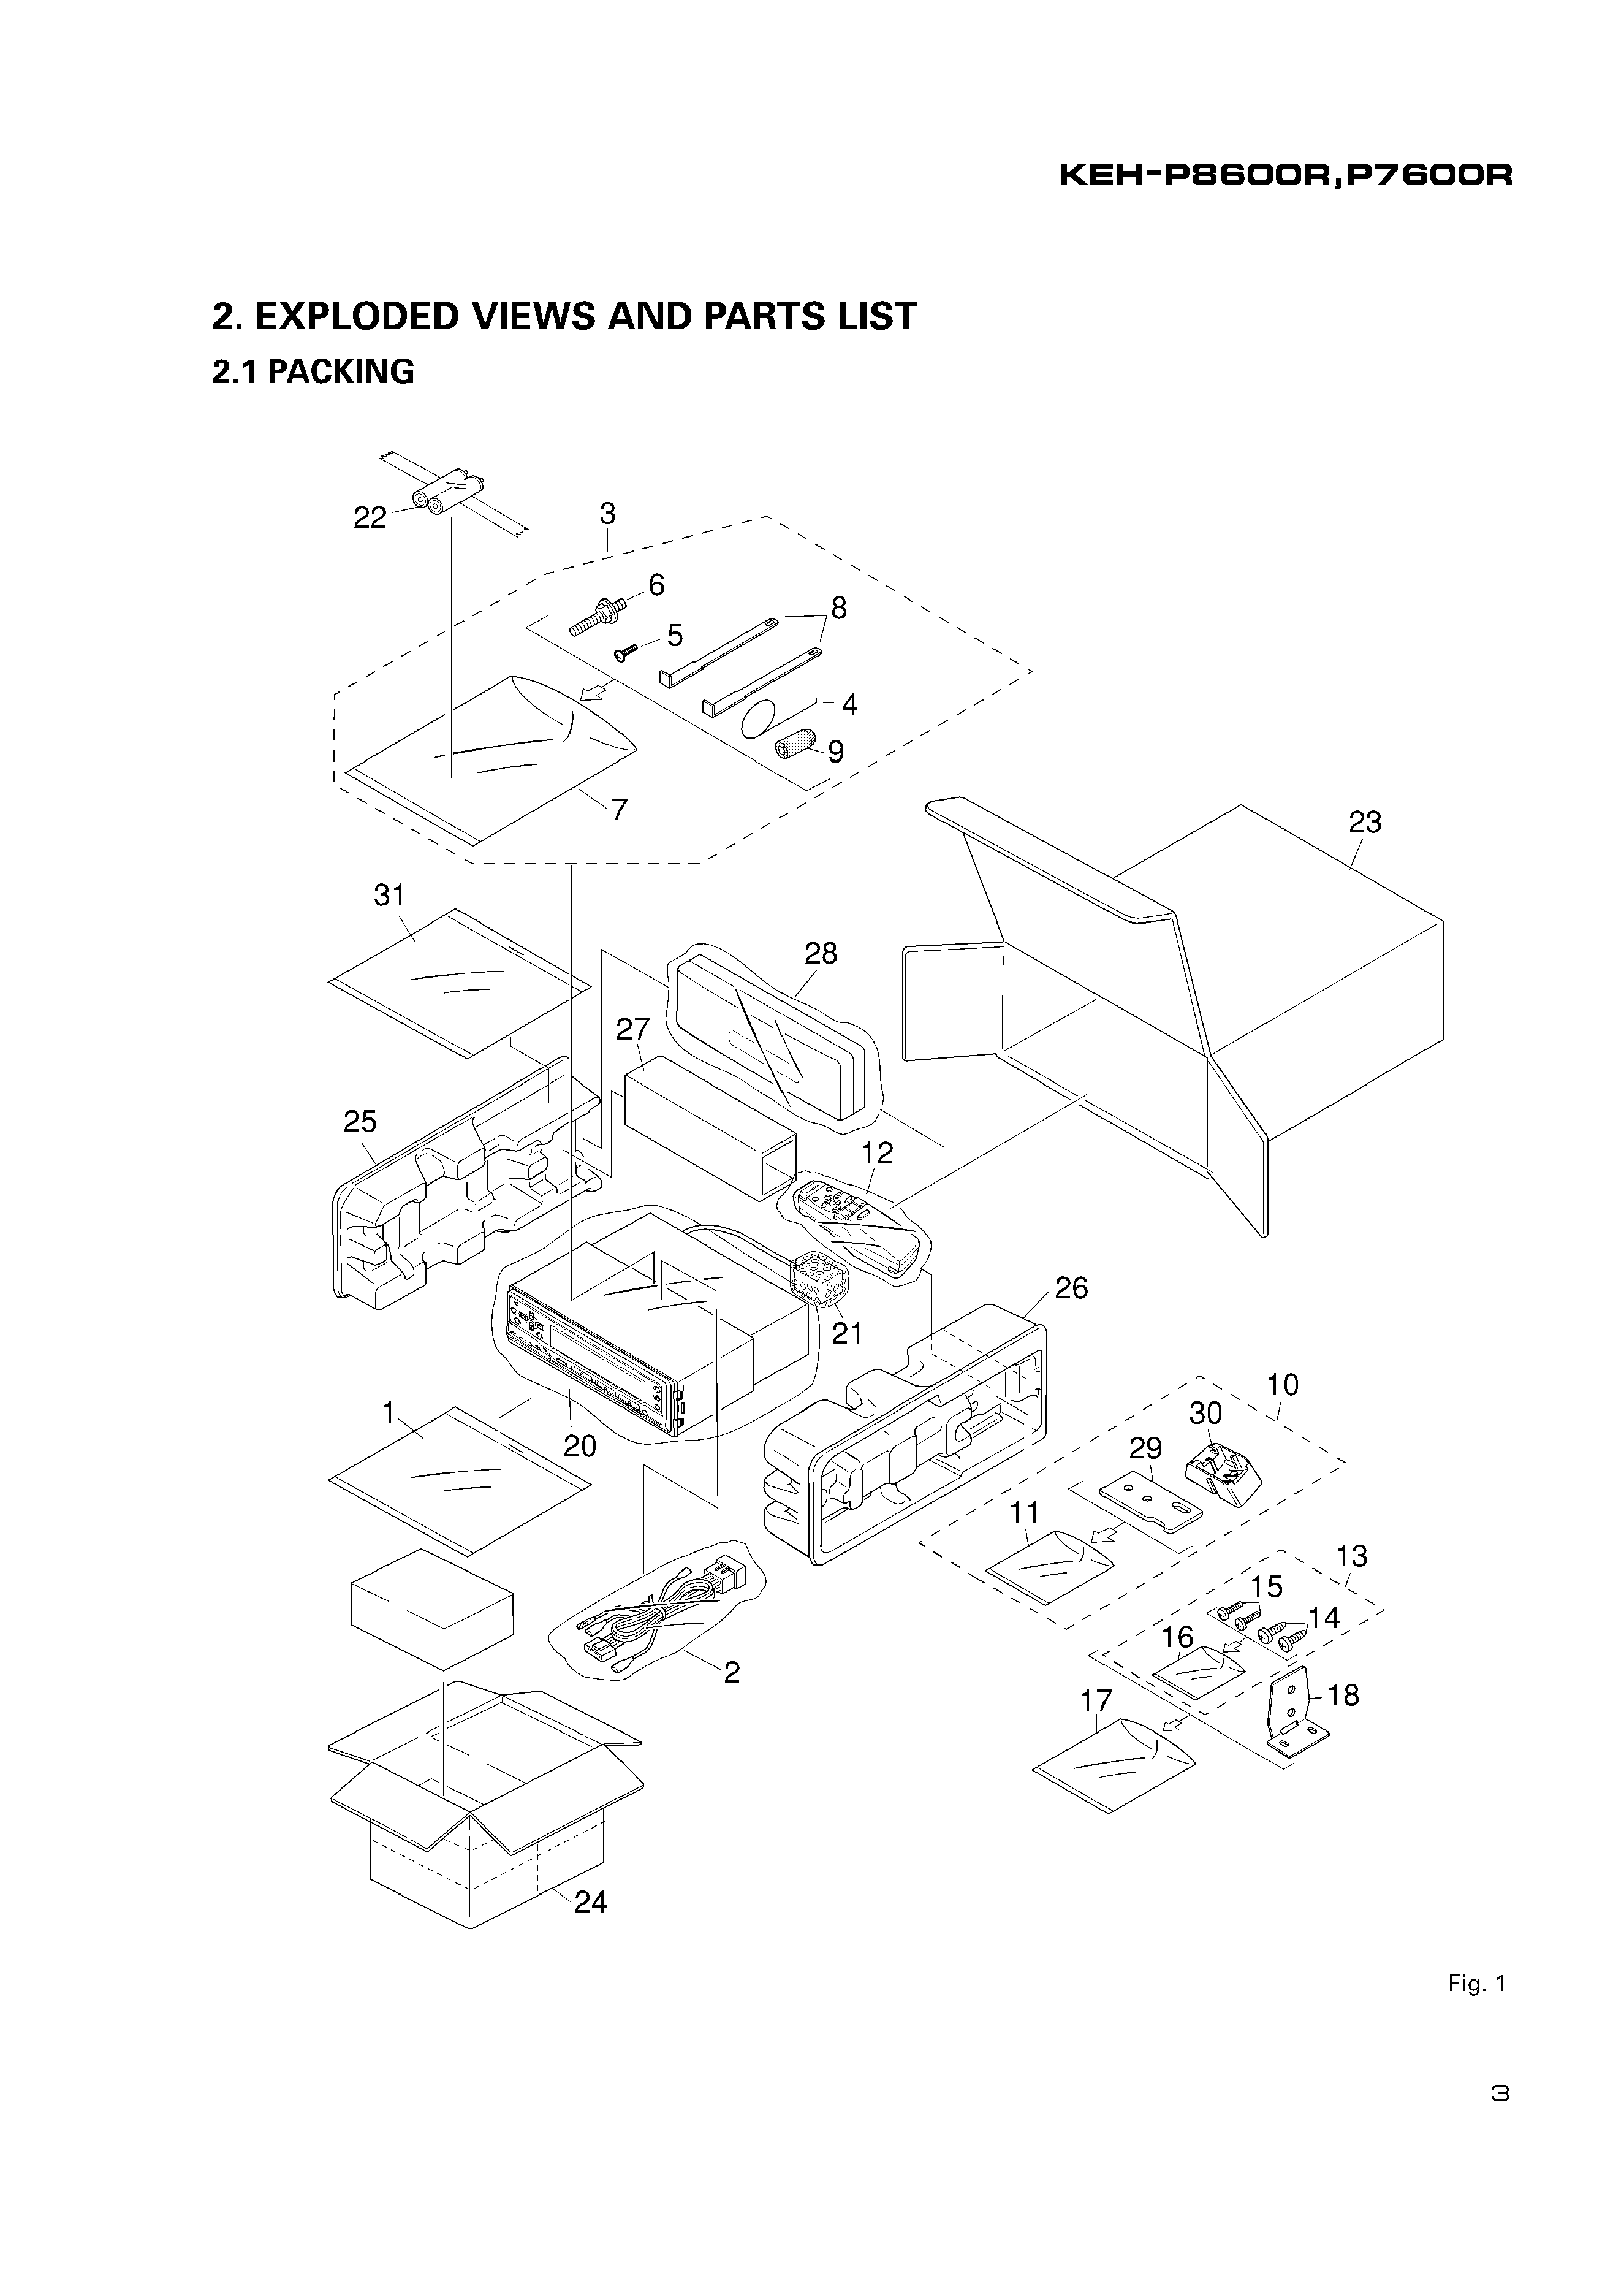 Service Manual For Pioneer Keh-p8600r Ew